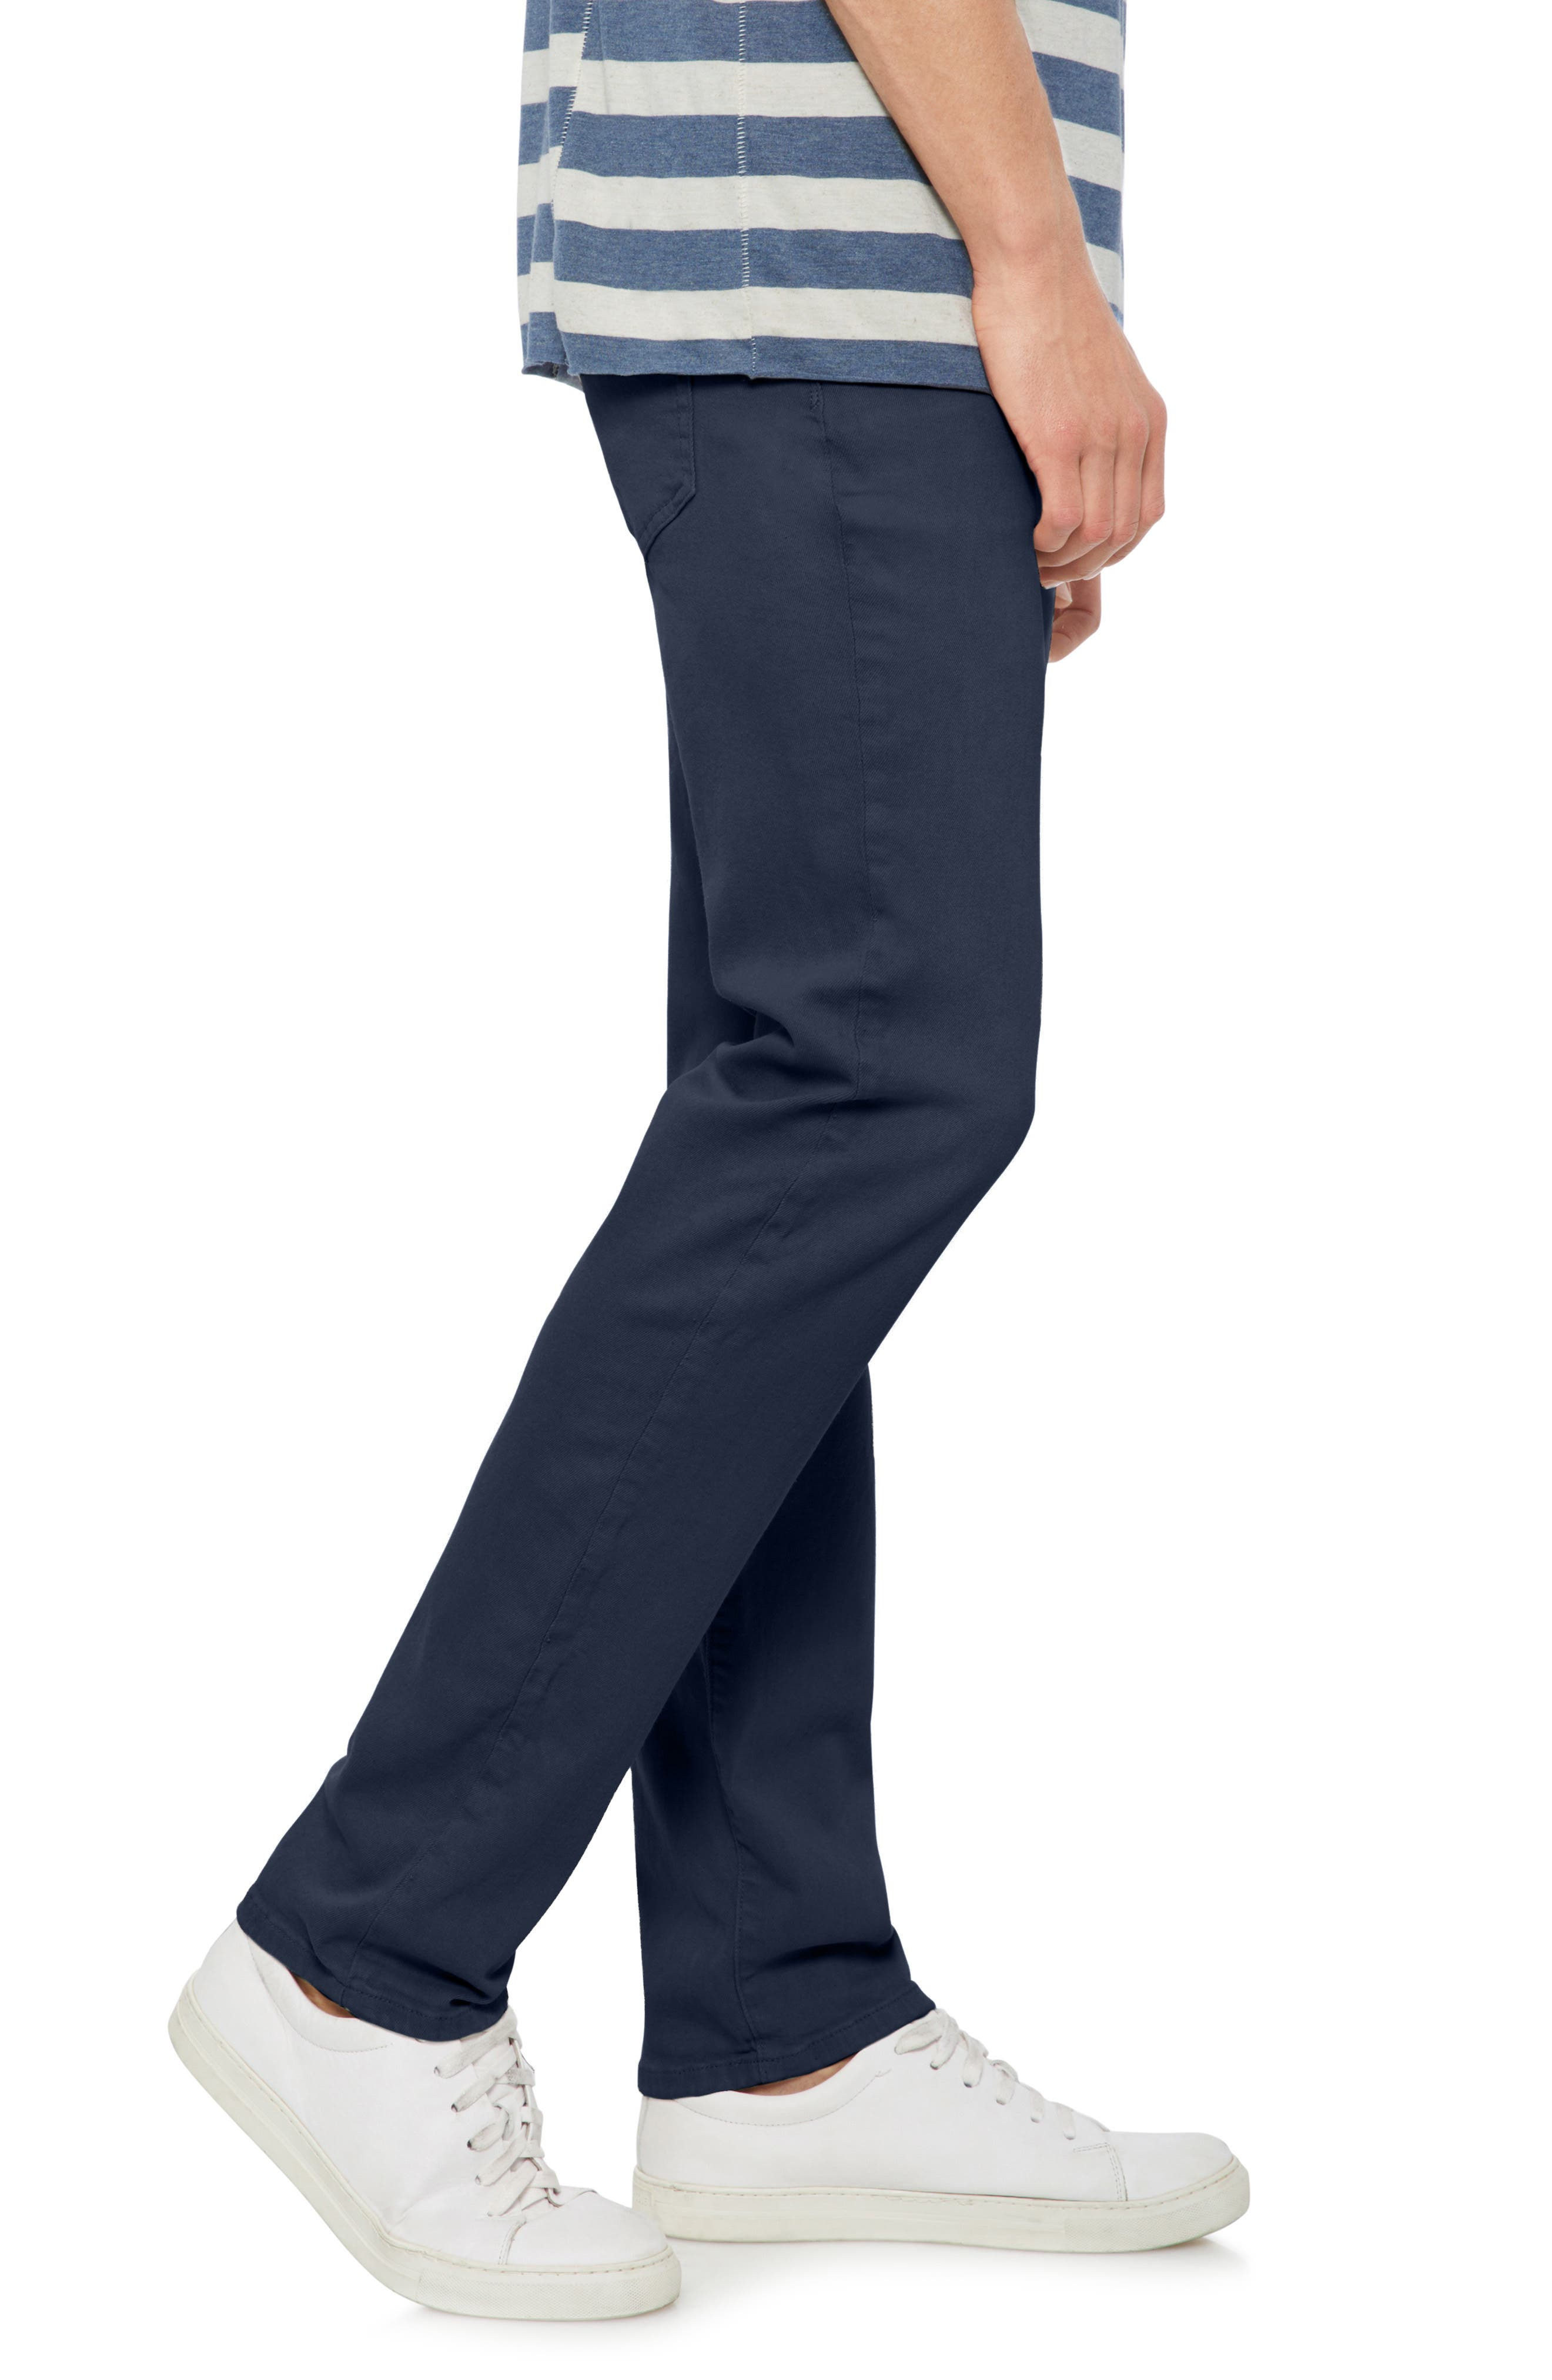 Brixton Slim Straight Leg Jeans,                             Alternate thumbnail 3, color,                             Navy